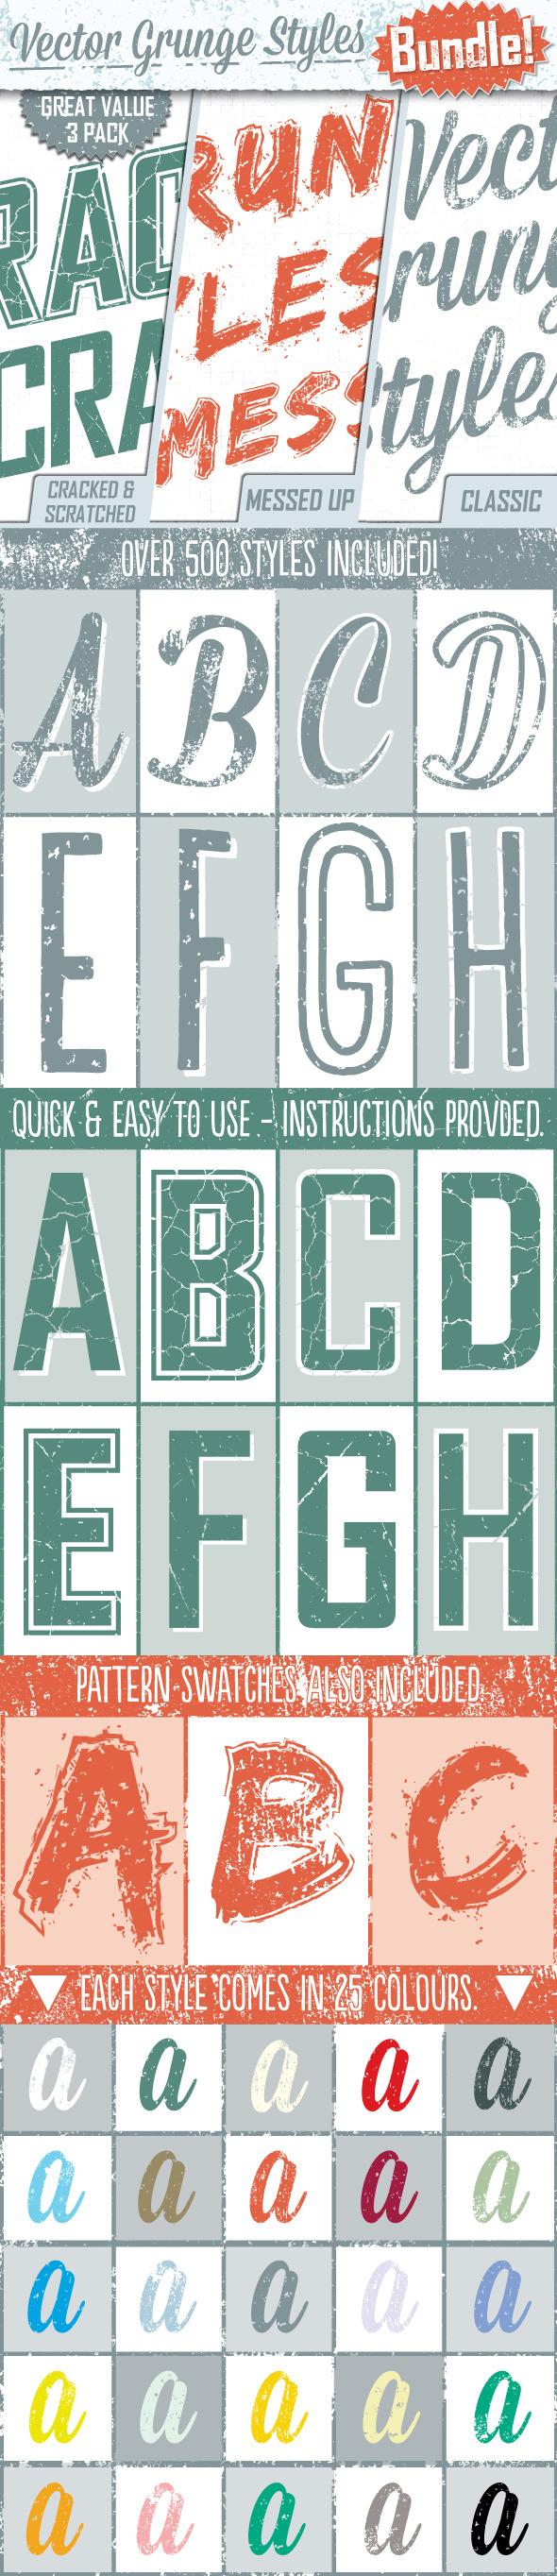 Grunge Text Styles Bundle - Styles Illustrator